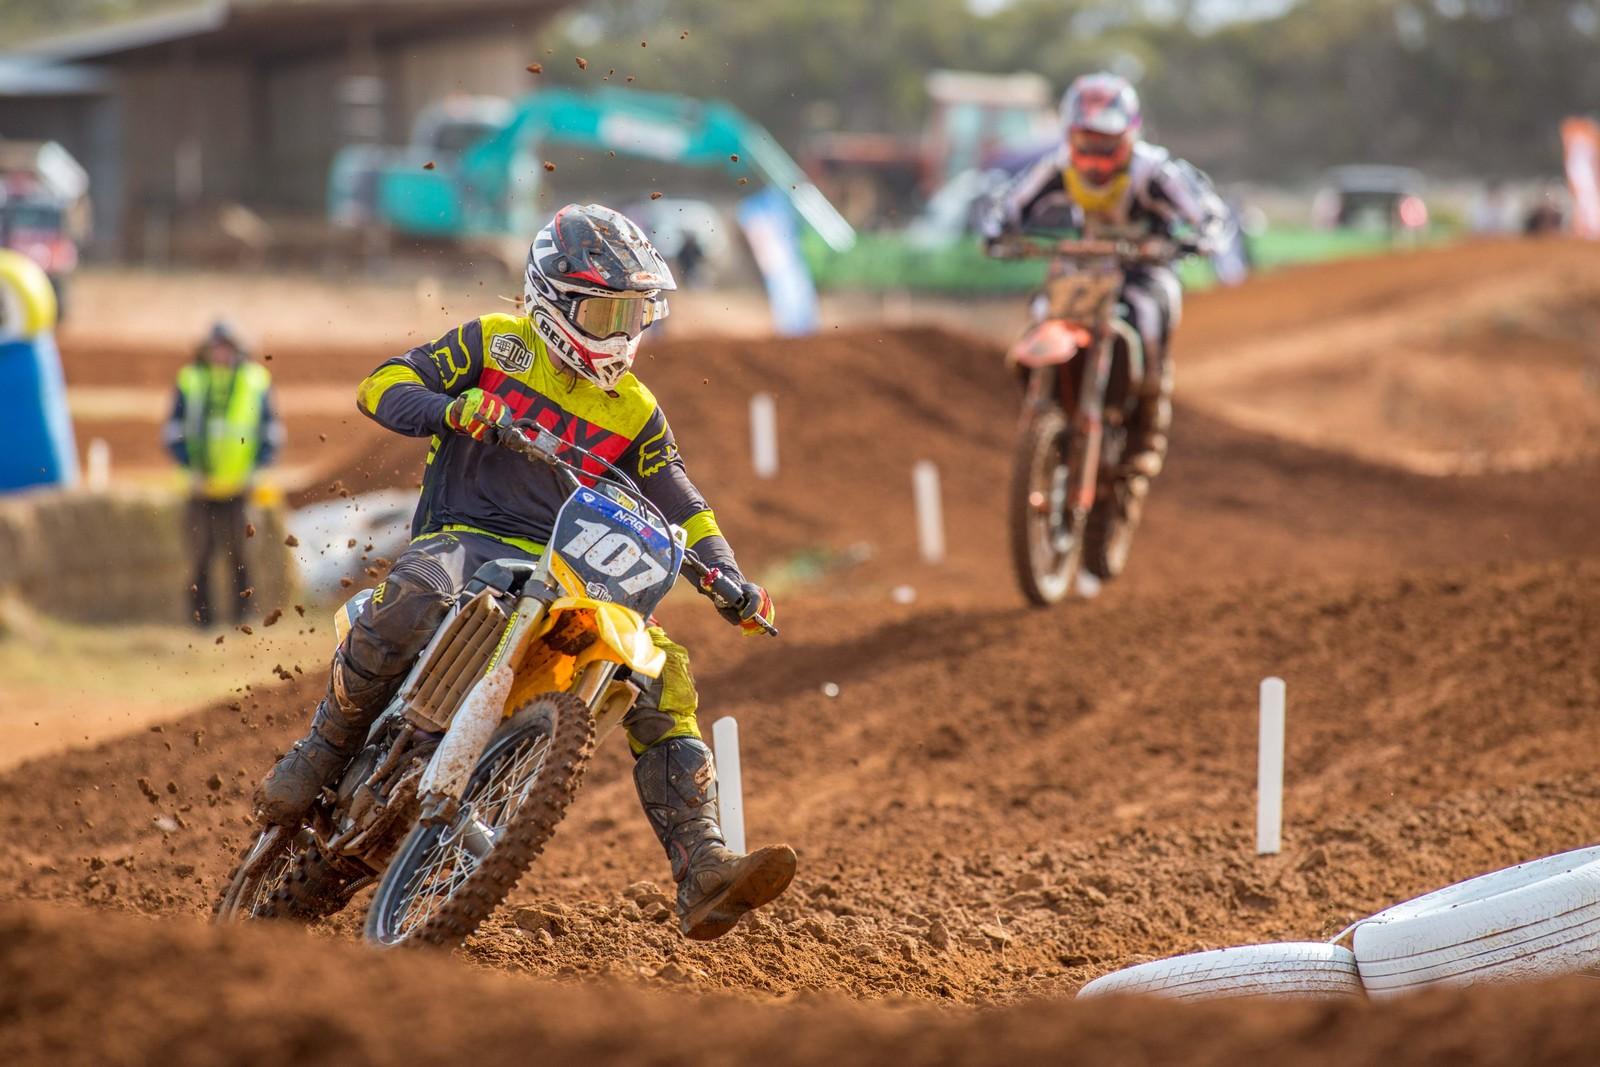 Darren Schenk - Australian Motul Mx Championships: Round 4, Murray Bridge - Motocross Pictures - Vital MX